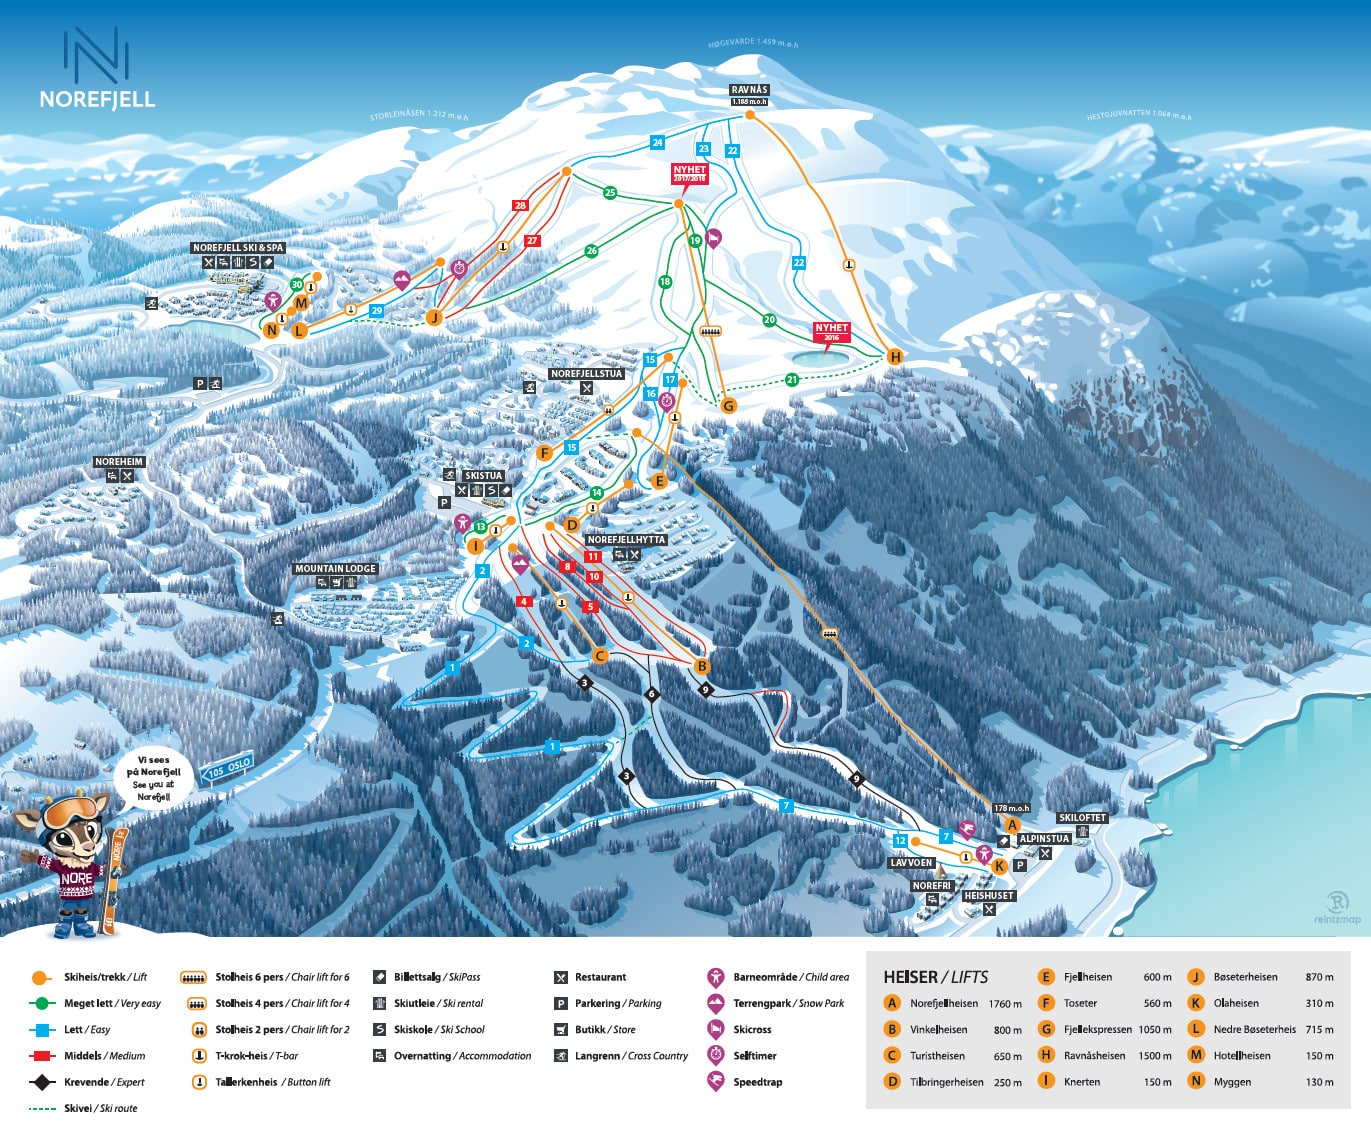 Norefjell Piste / Trail Map